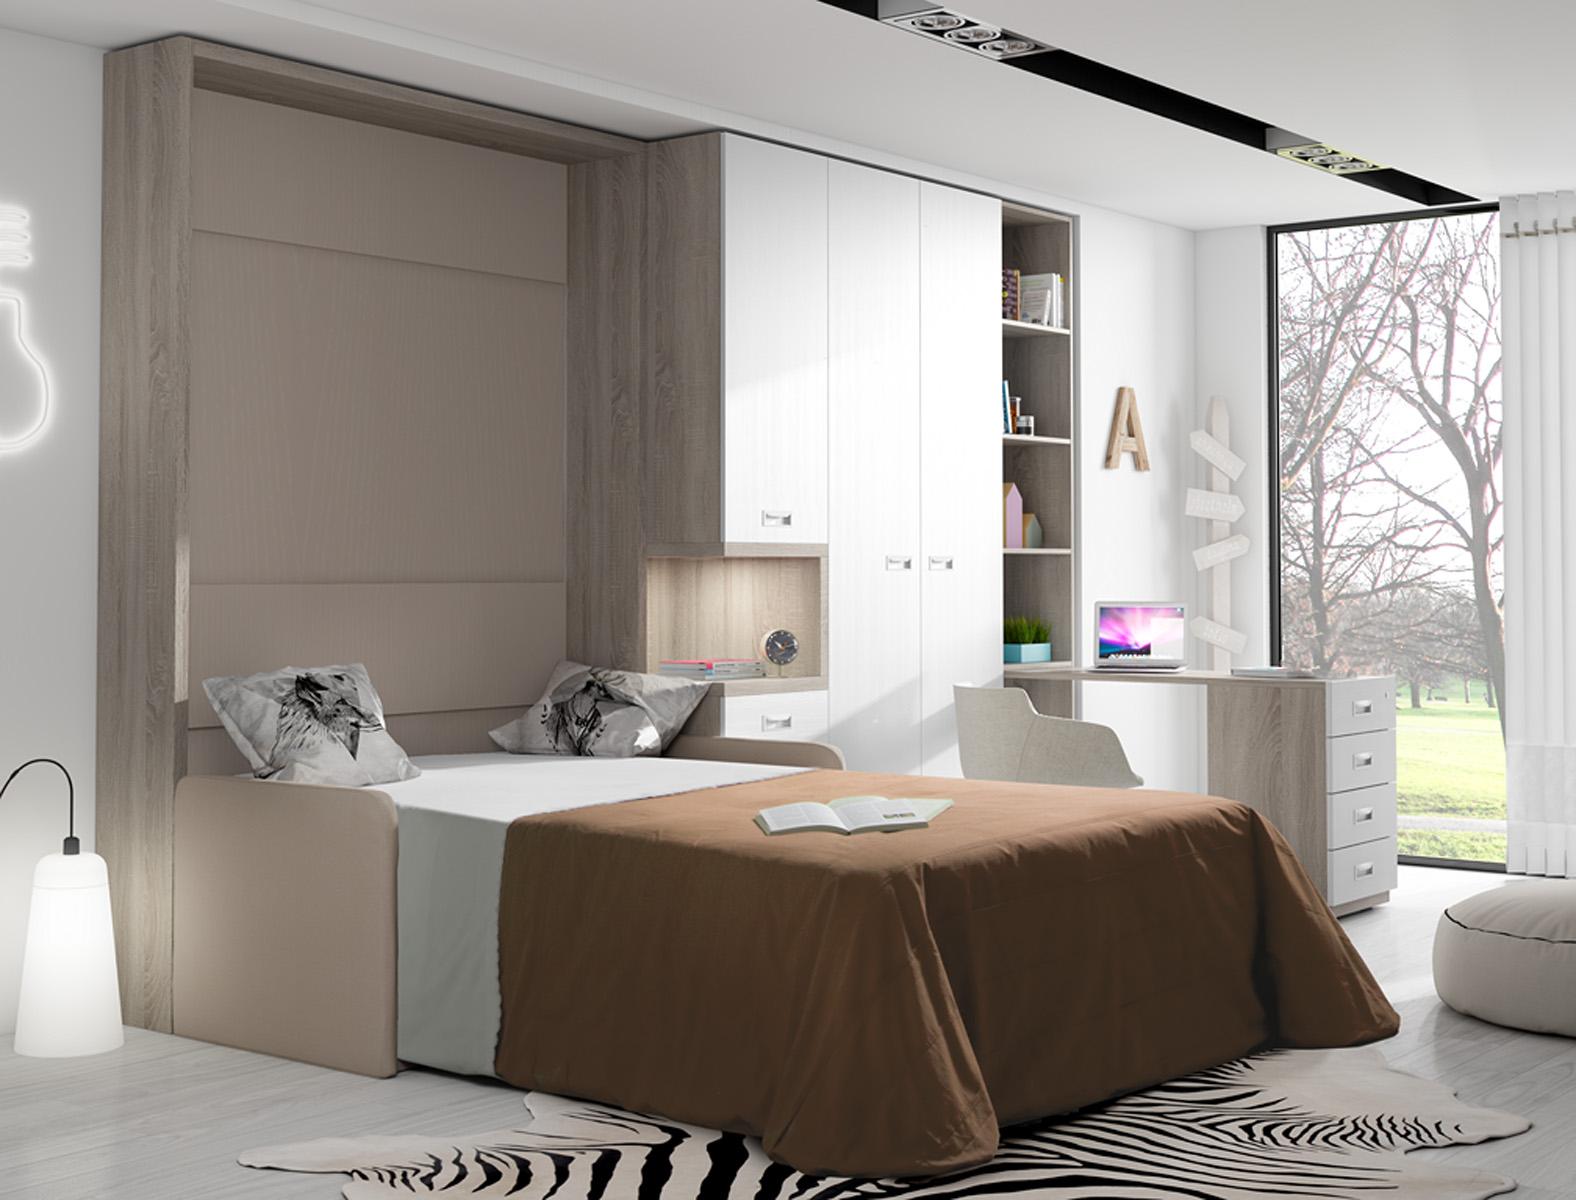 Cama abatible sofa matrimonio - Fabricante camas abatibles ...